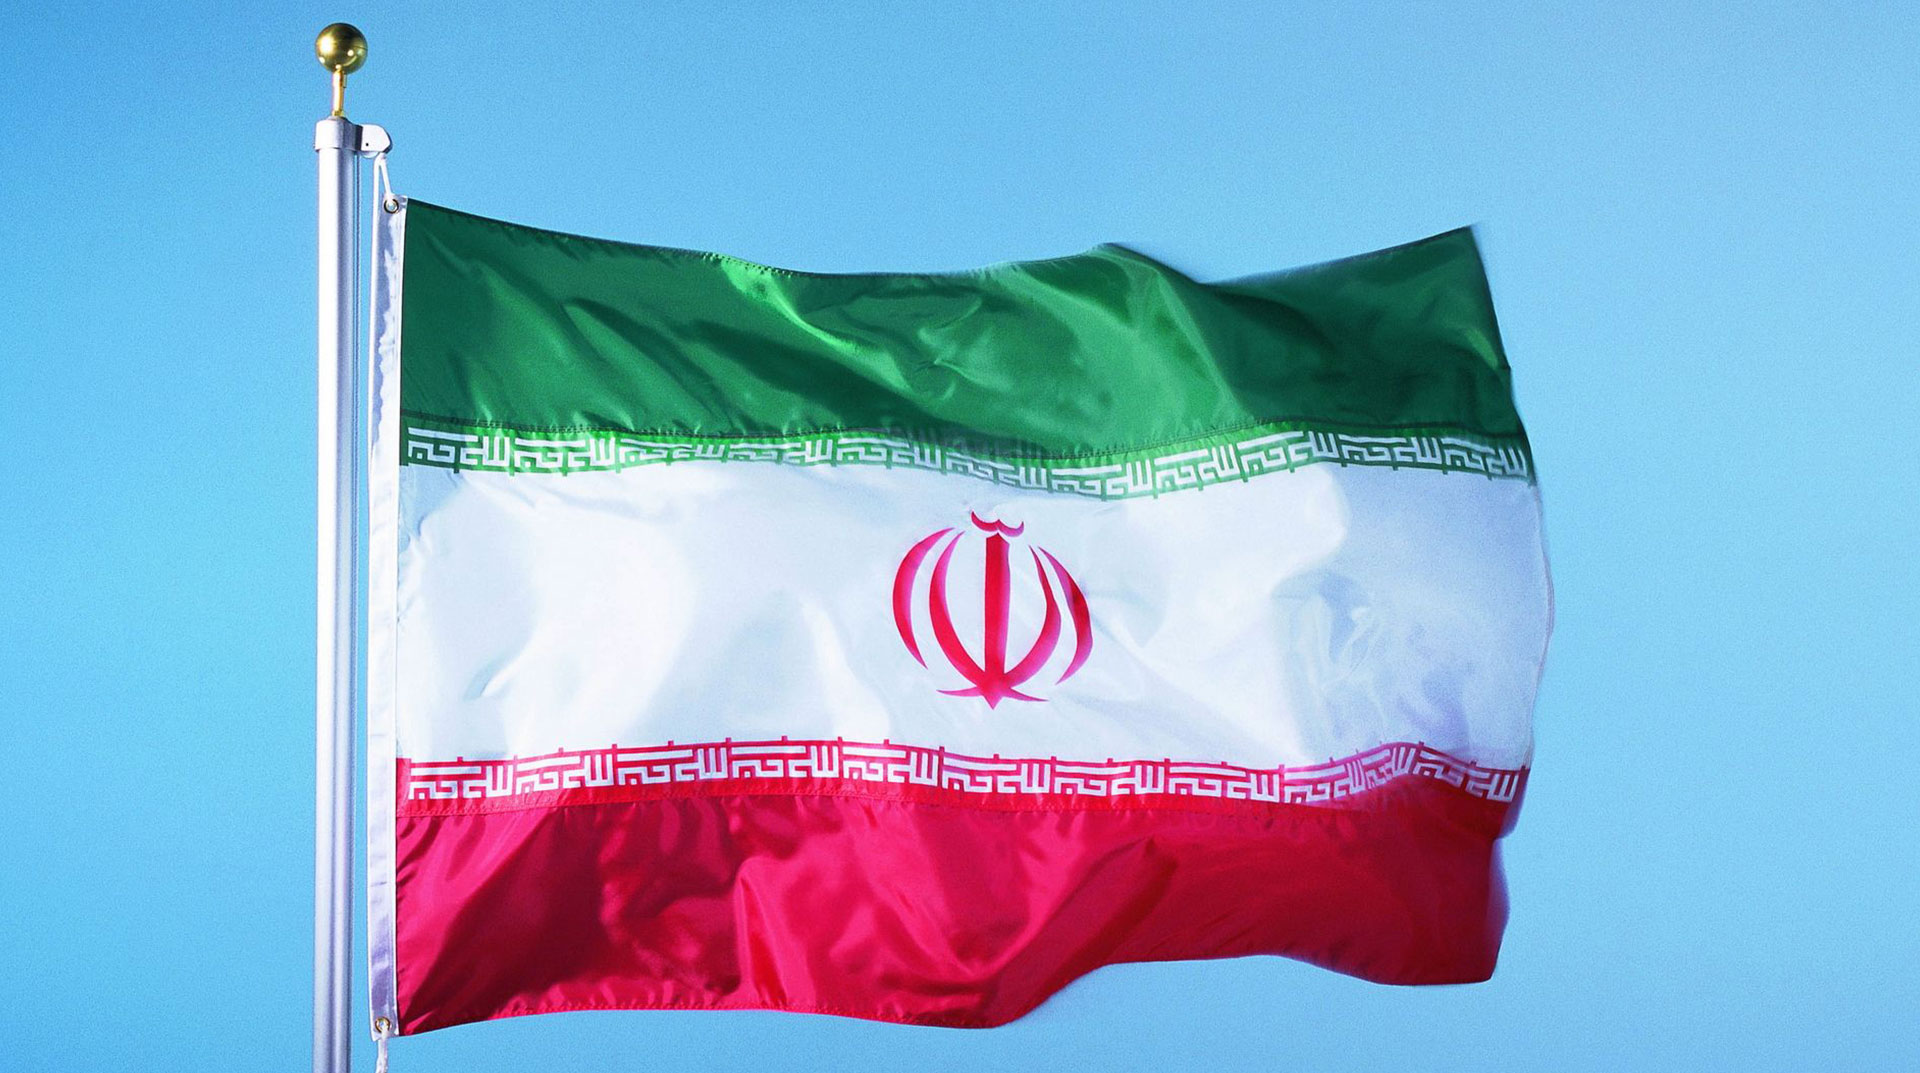 İran Devrim Muhafızları Komutanı Müslim Şahadan'ın öldürüldüğü iddia edildi